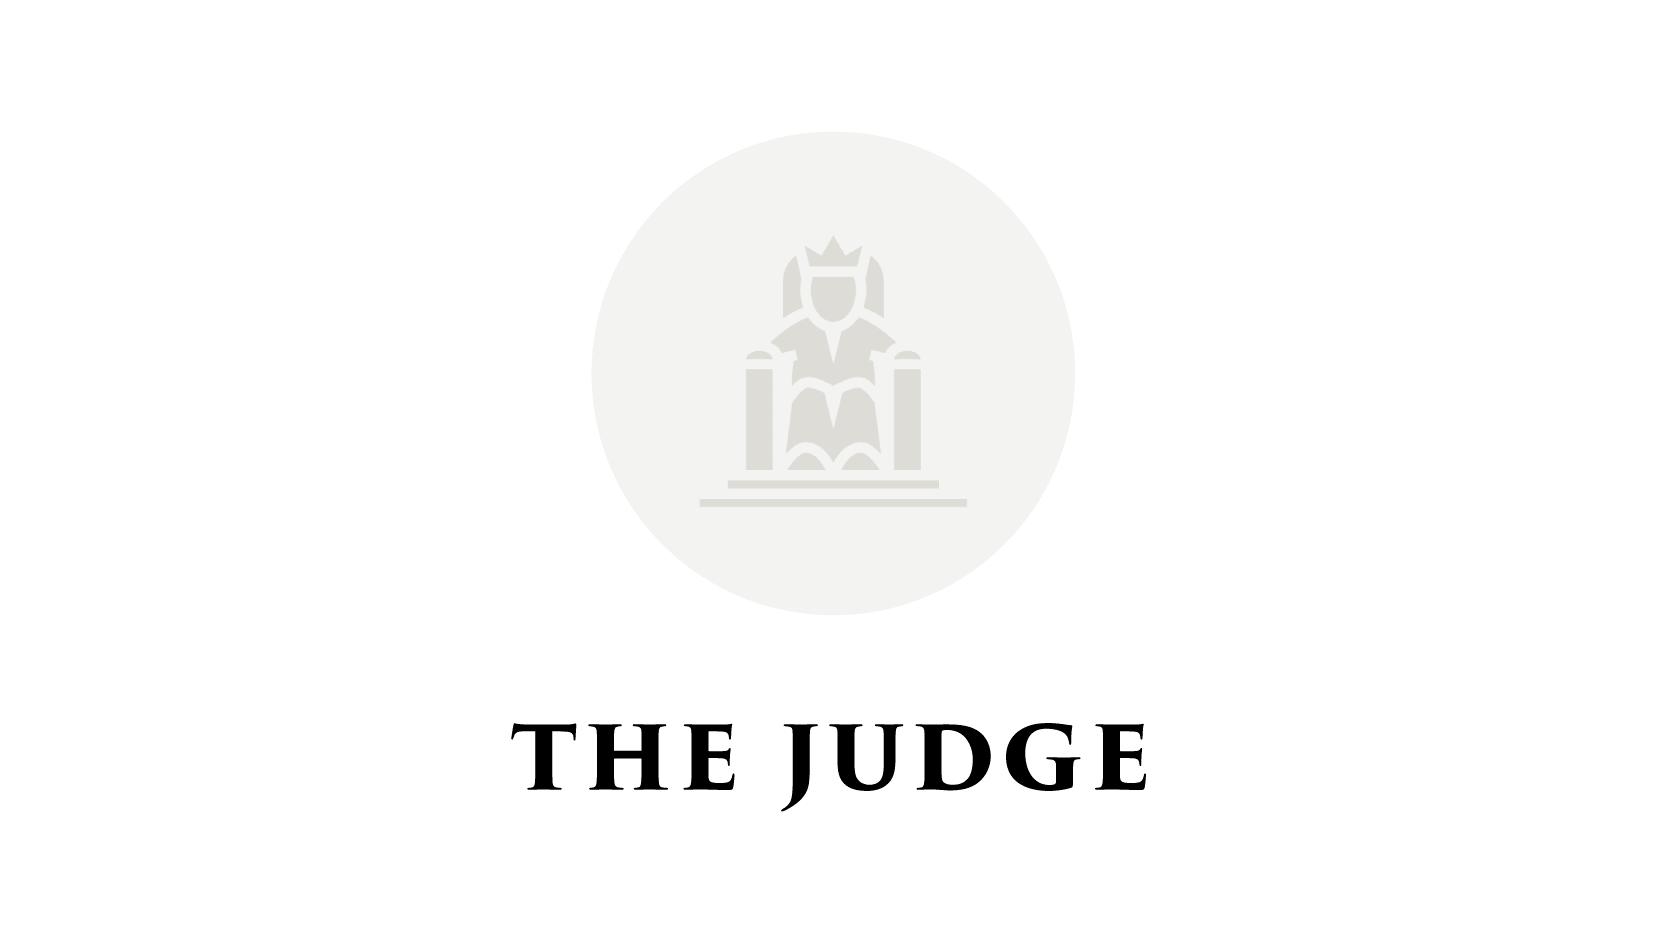 icon-pairs-fun_the-judge